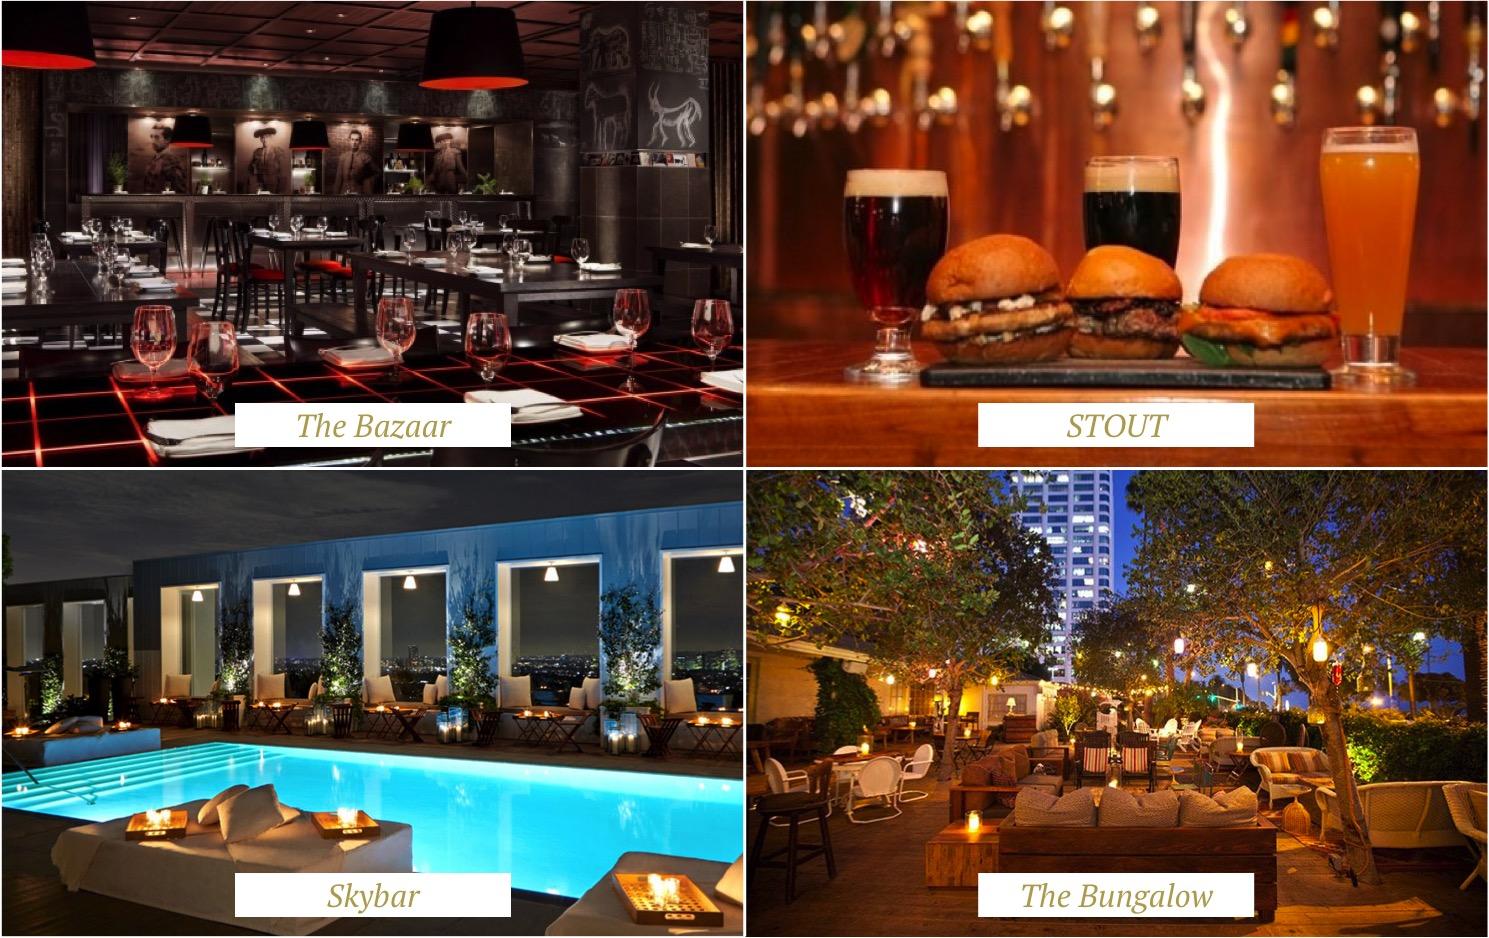 restaurants Los angeles - melhores restaurants LA - santa monica - beverly hills - west hollywood - highway 1 dicas california